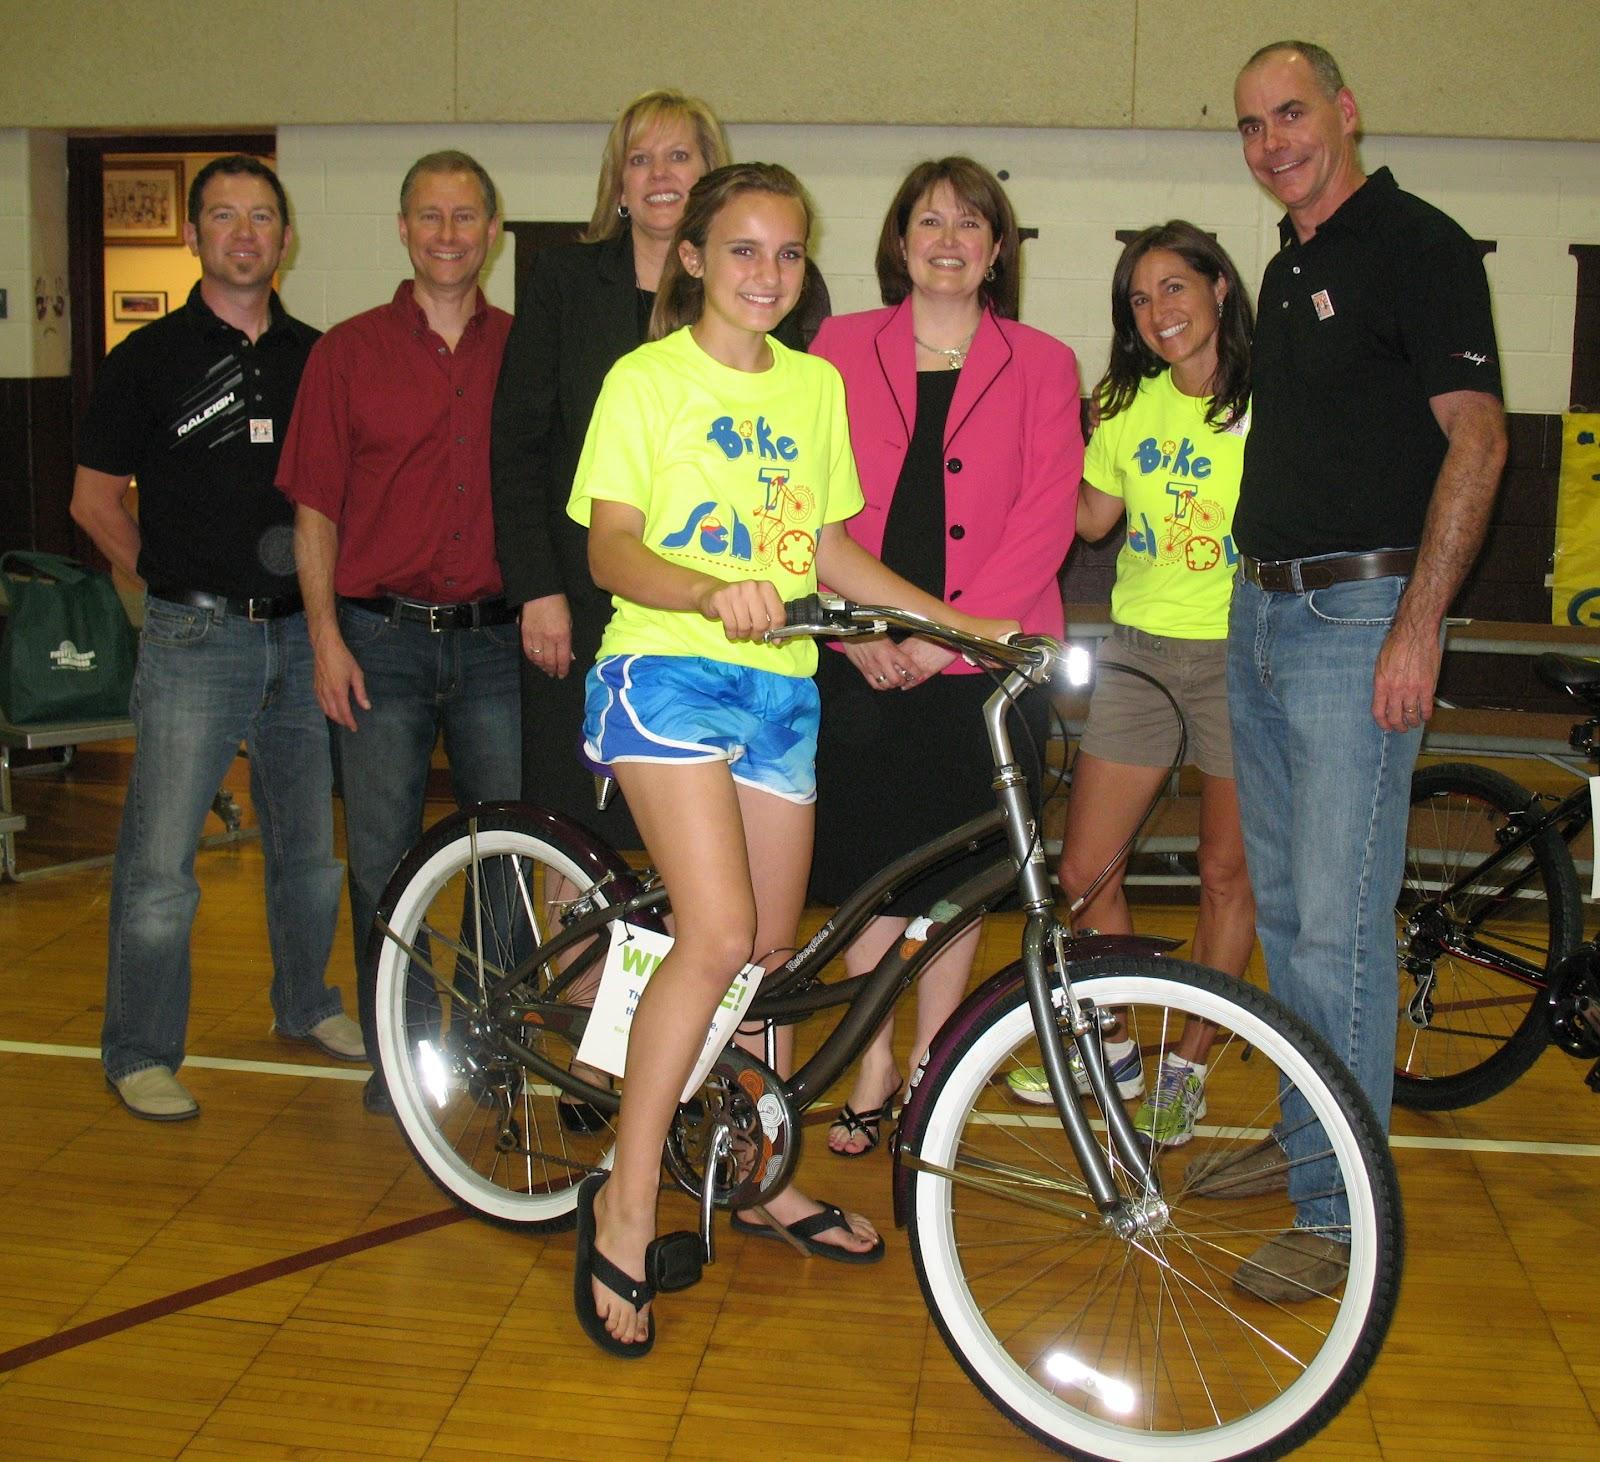 Century Cycles Blog: Rocky River Bike To School: 12,240